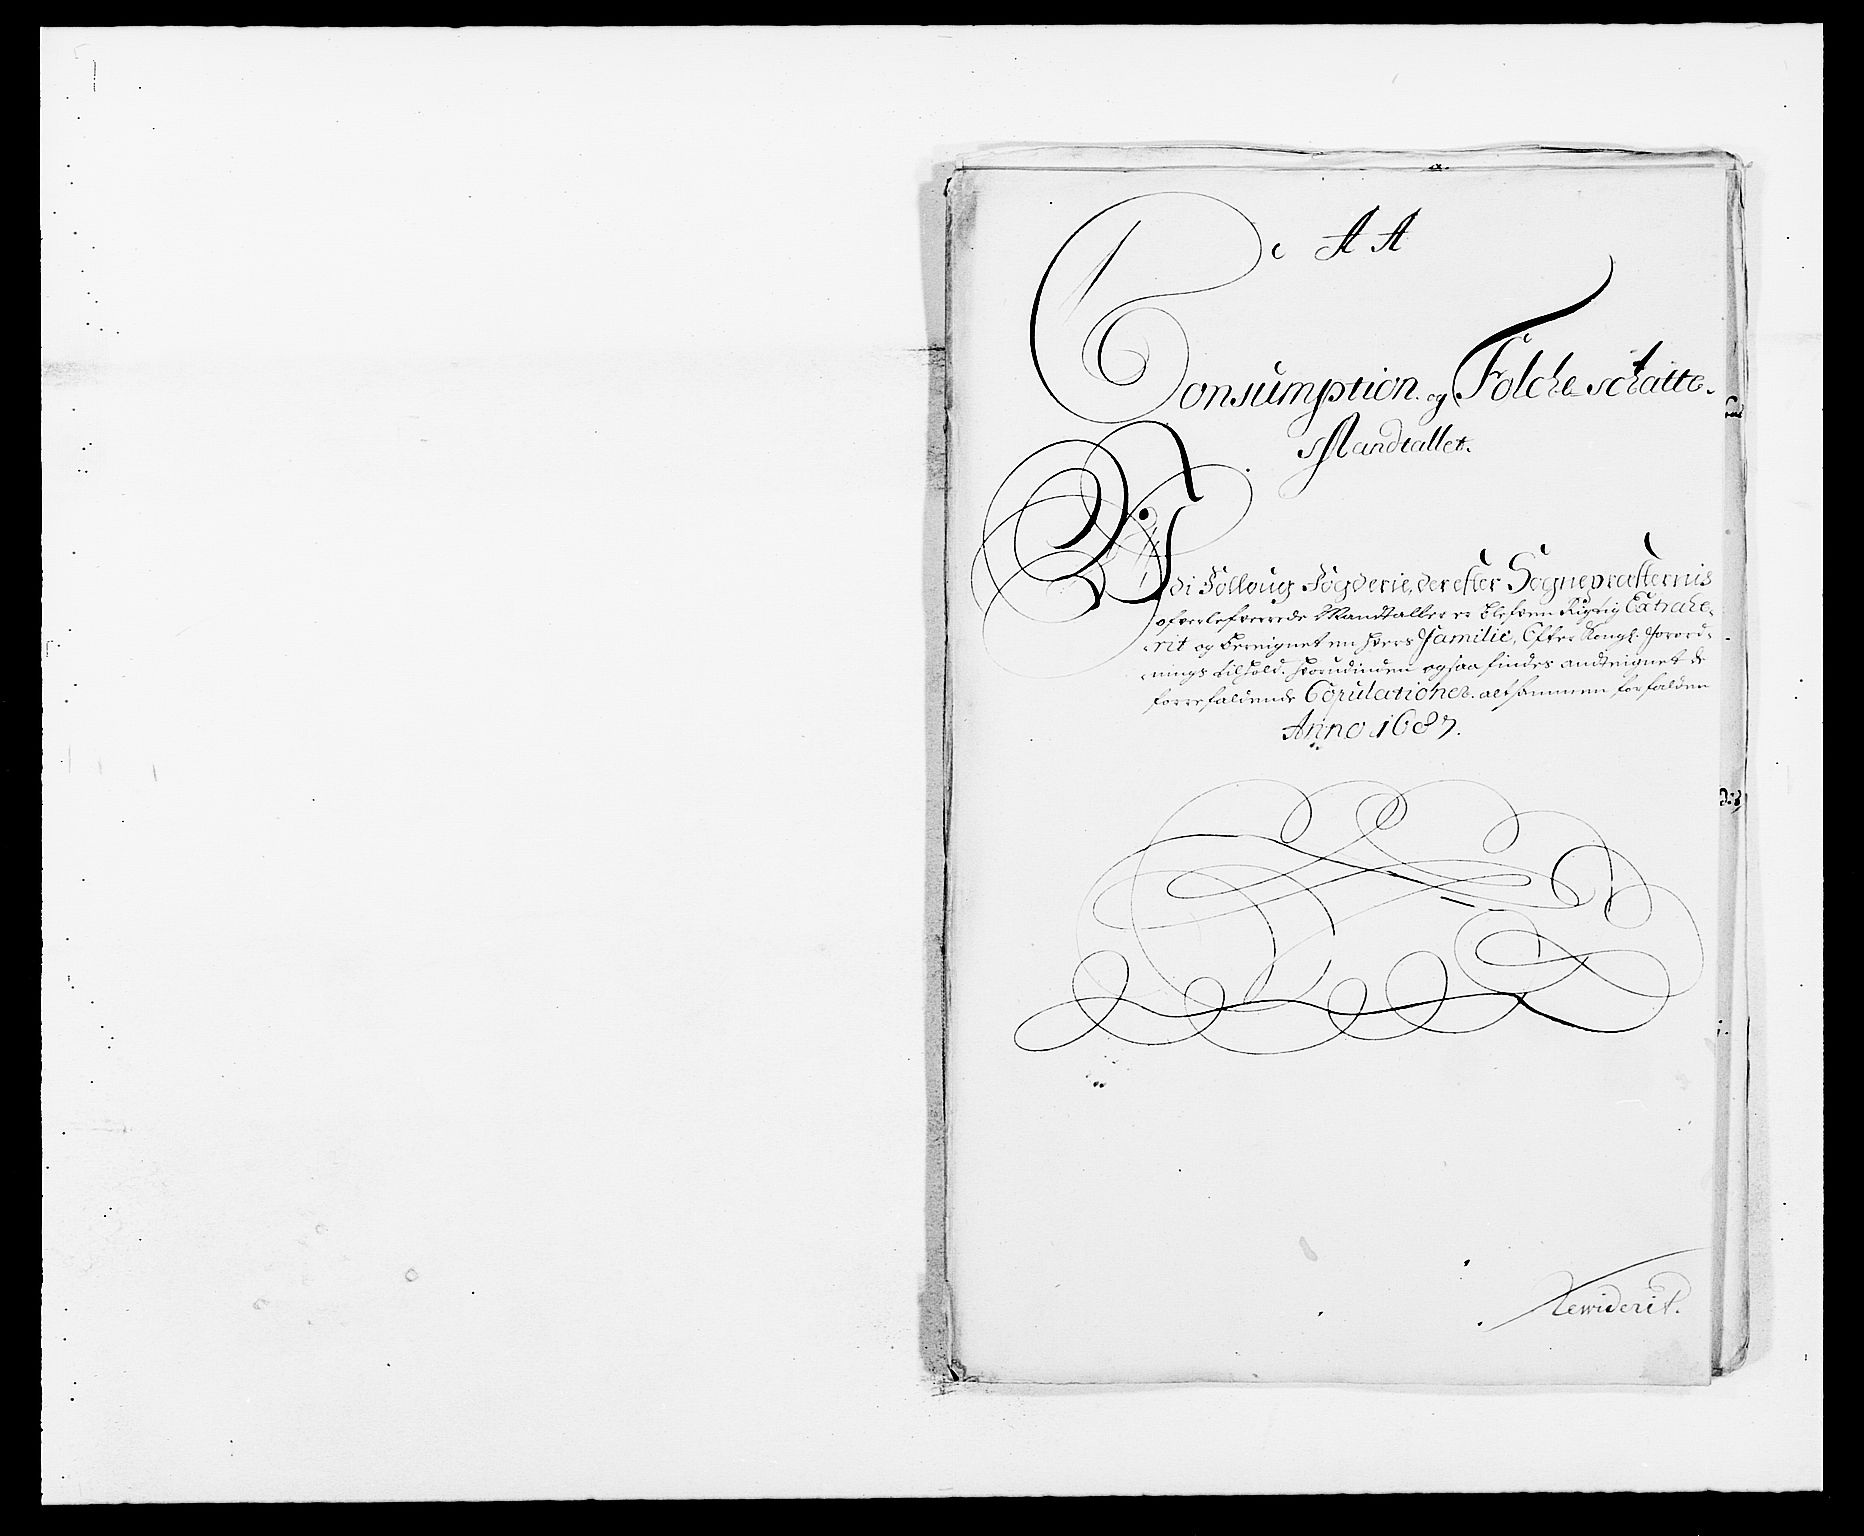 RA, Rentekammeret inntil 1814, Reviderte regnskaper, Fogderegnskap, R09/L0434: Fogderegnskap Follo, 1687-1688, s. 176